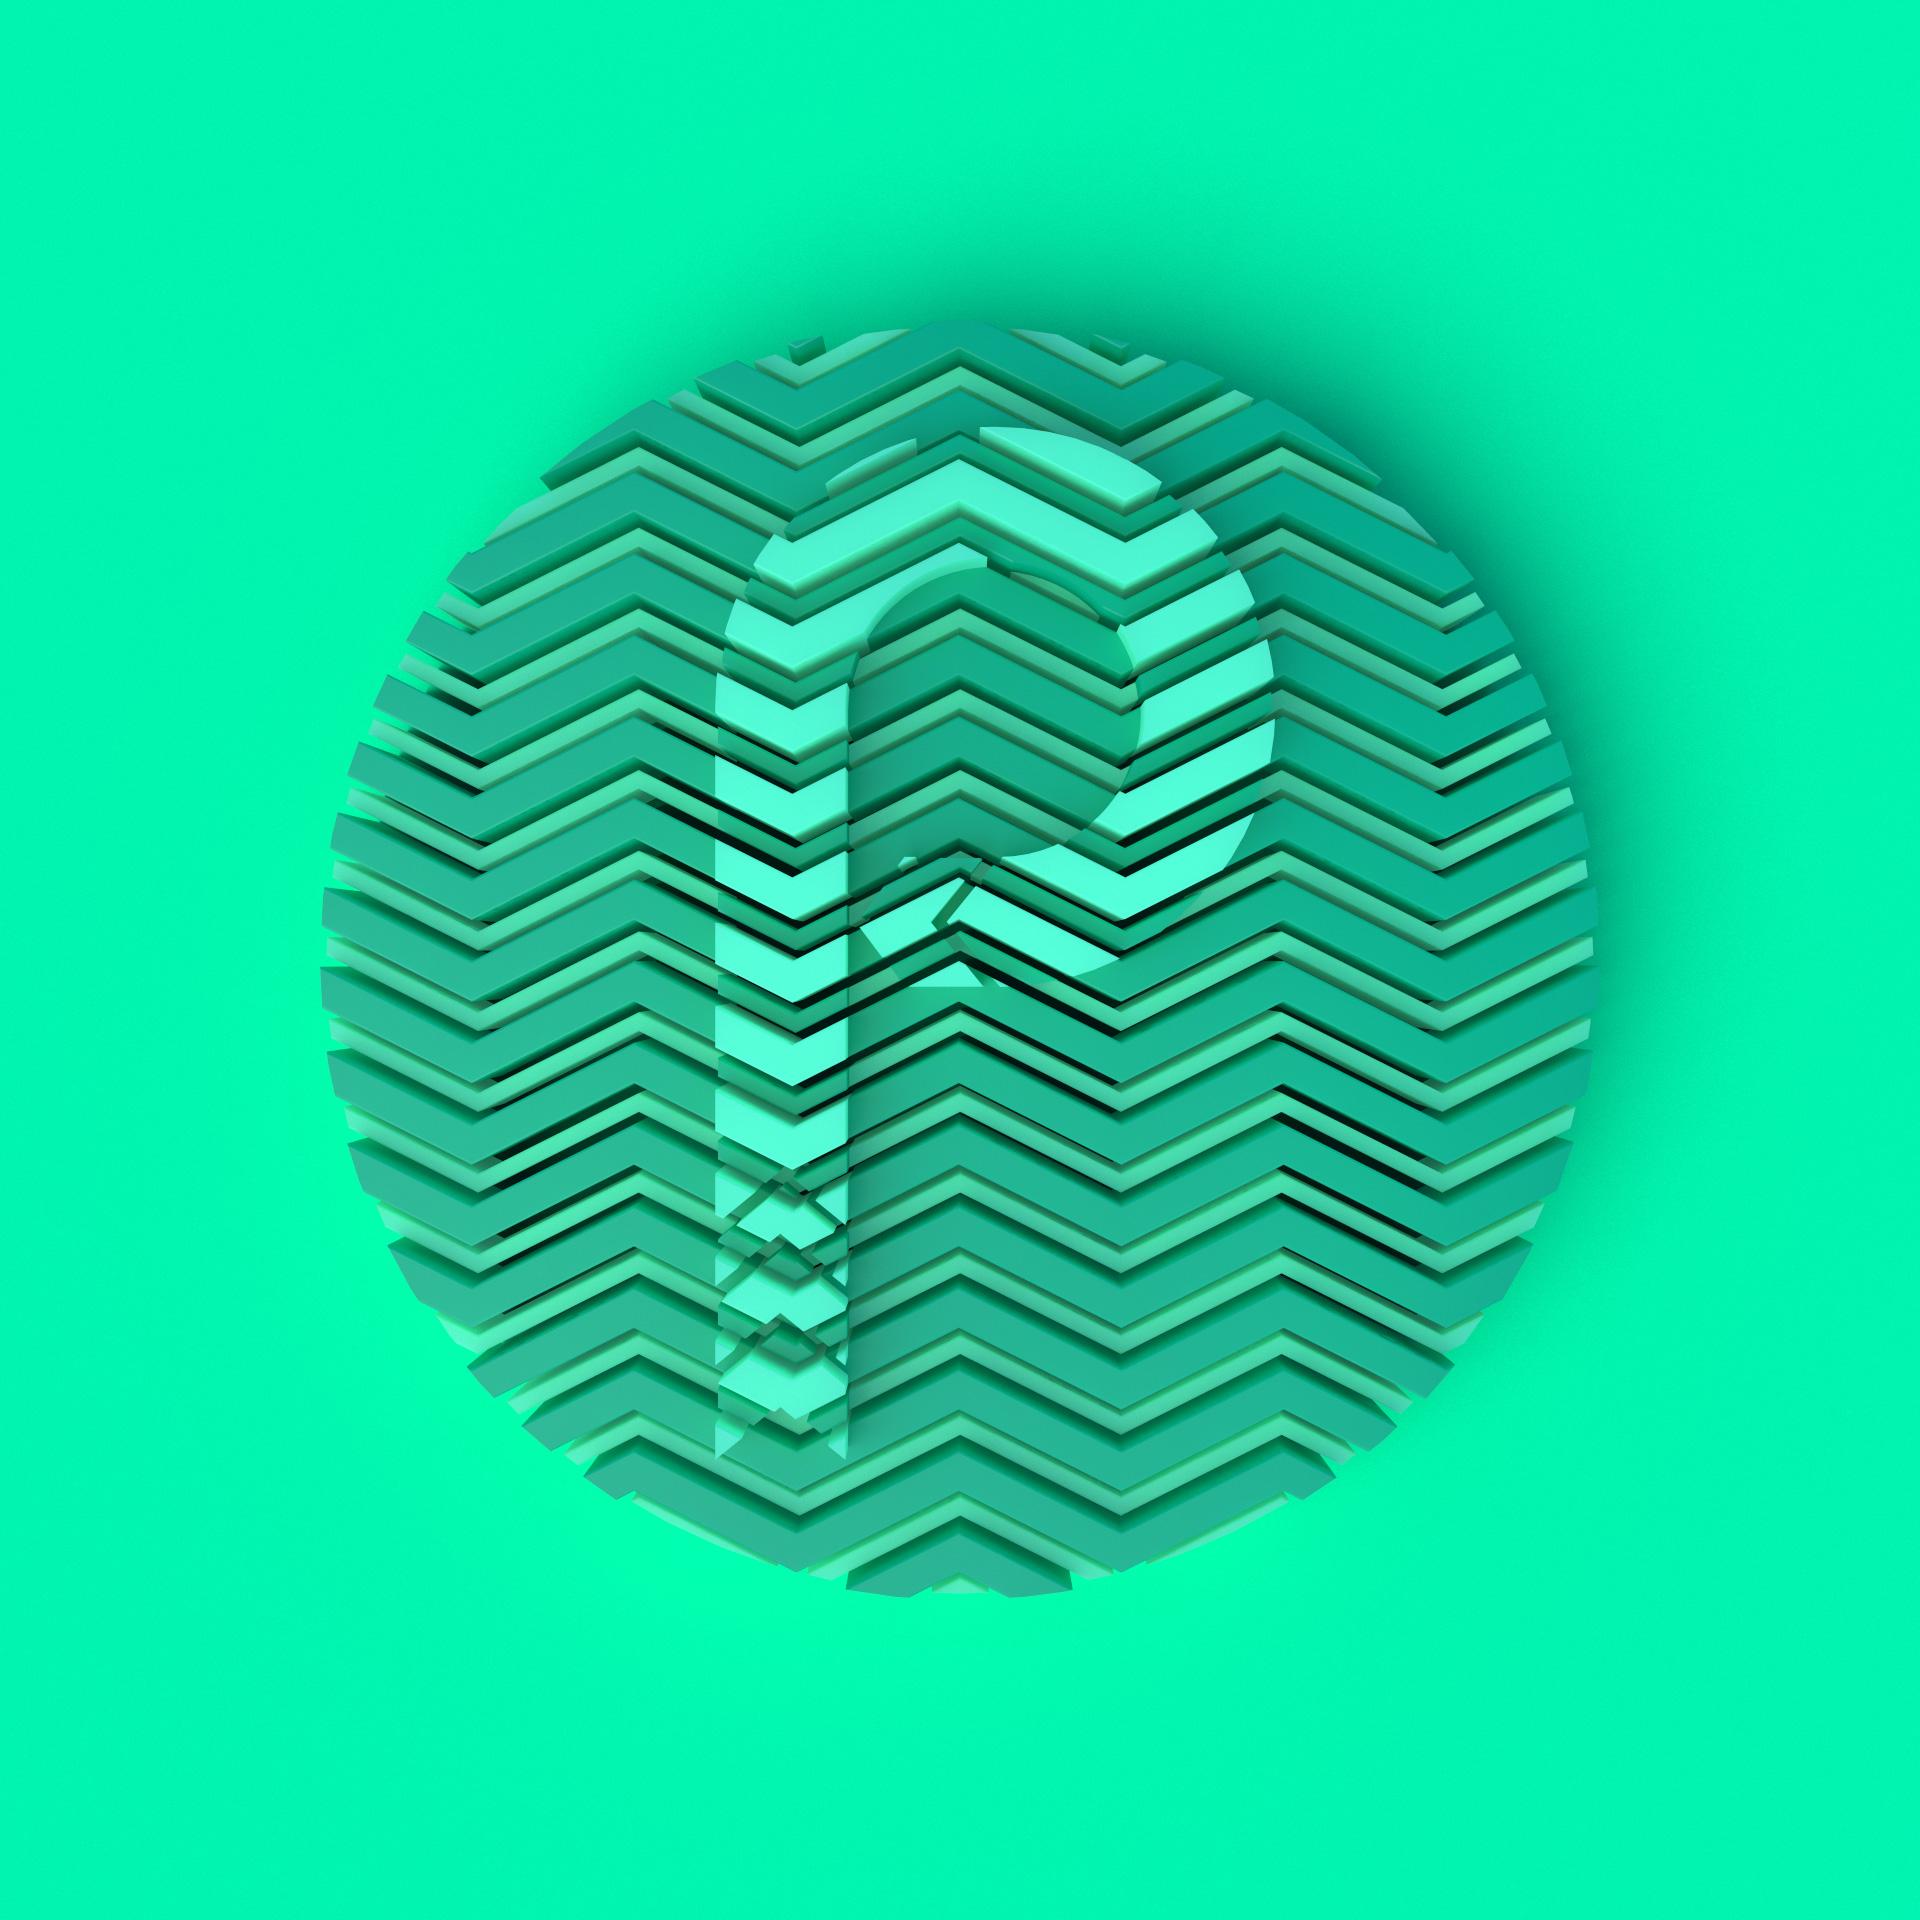 Zig-Zag-Lines-Green0015.jpg